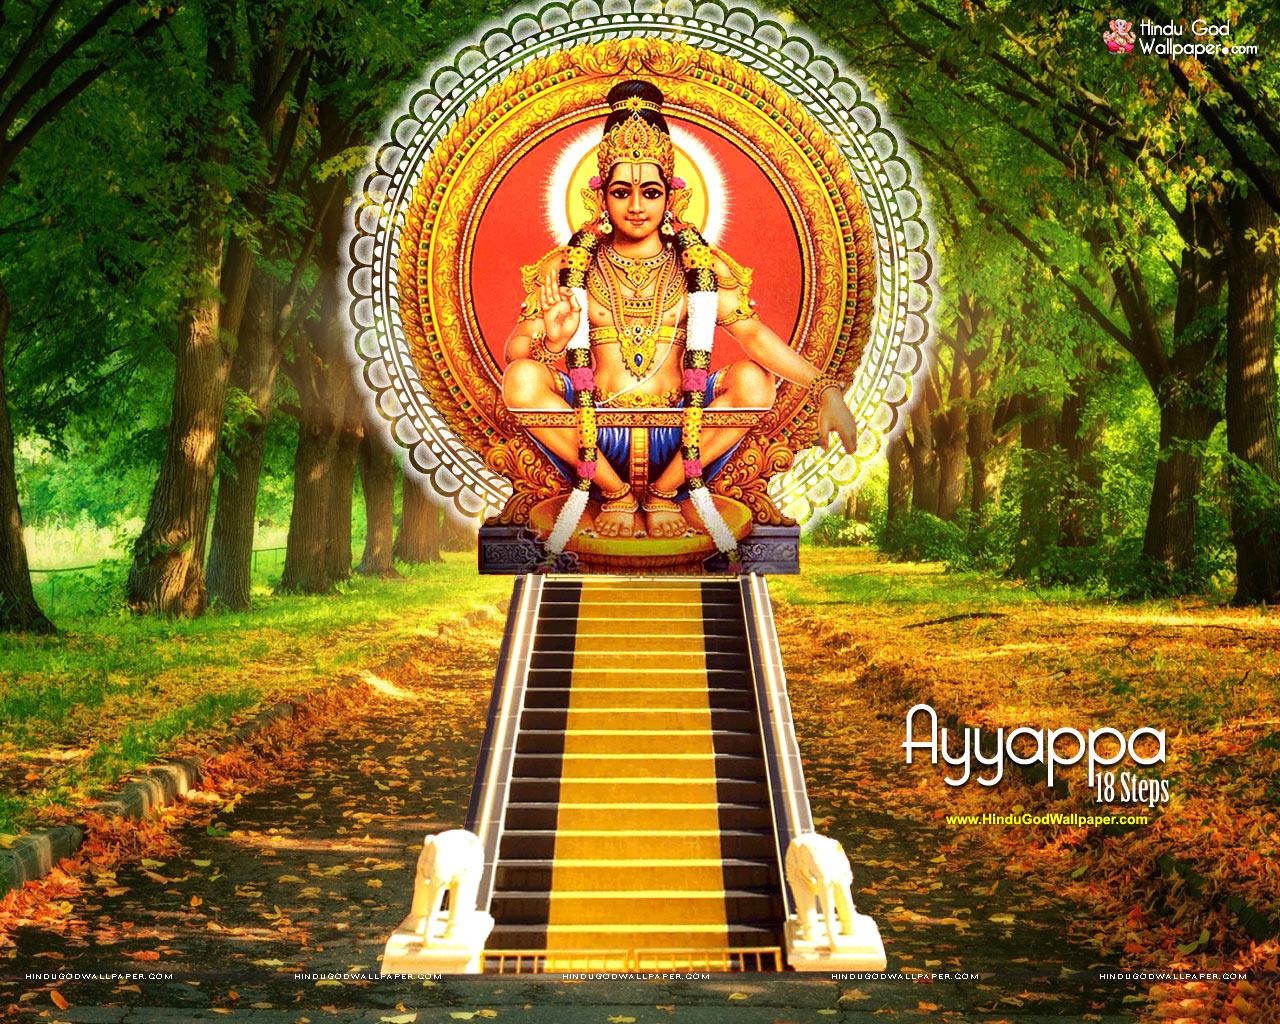 Ayyappa Wallpaper Hd High Resolution Download